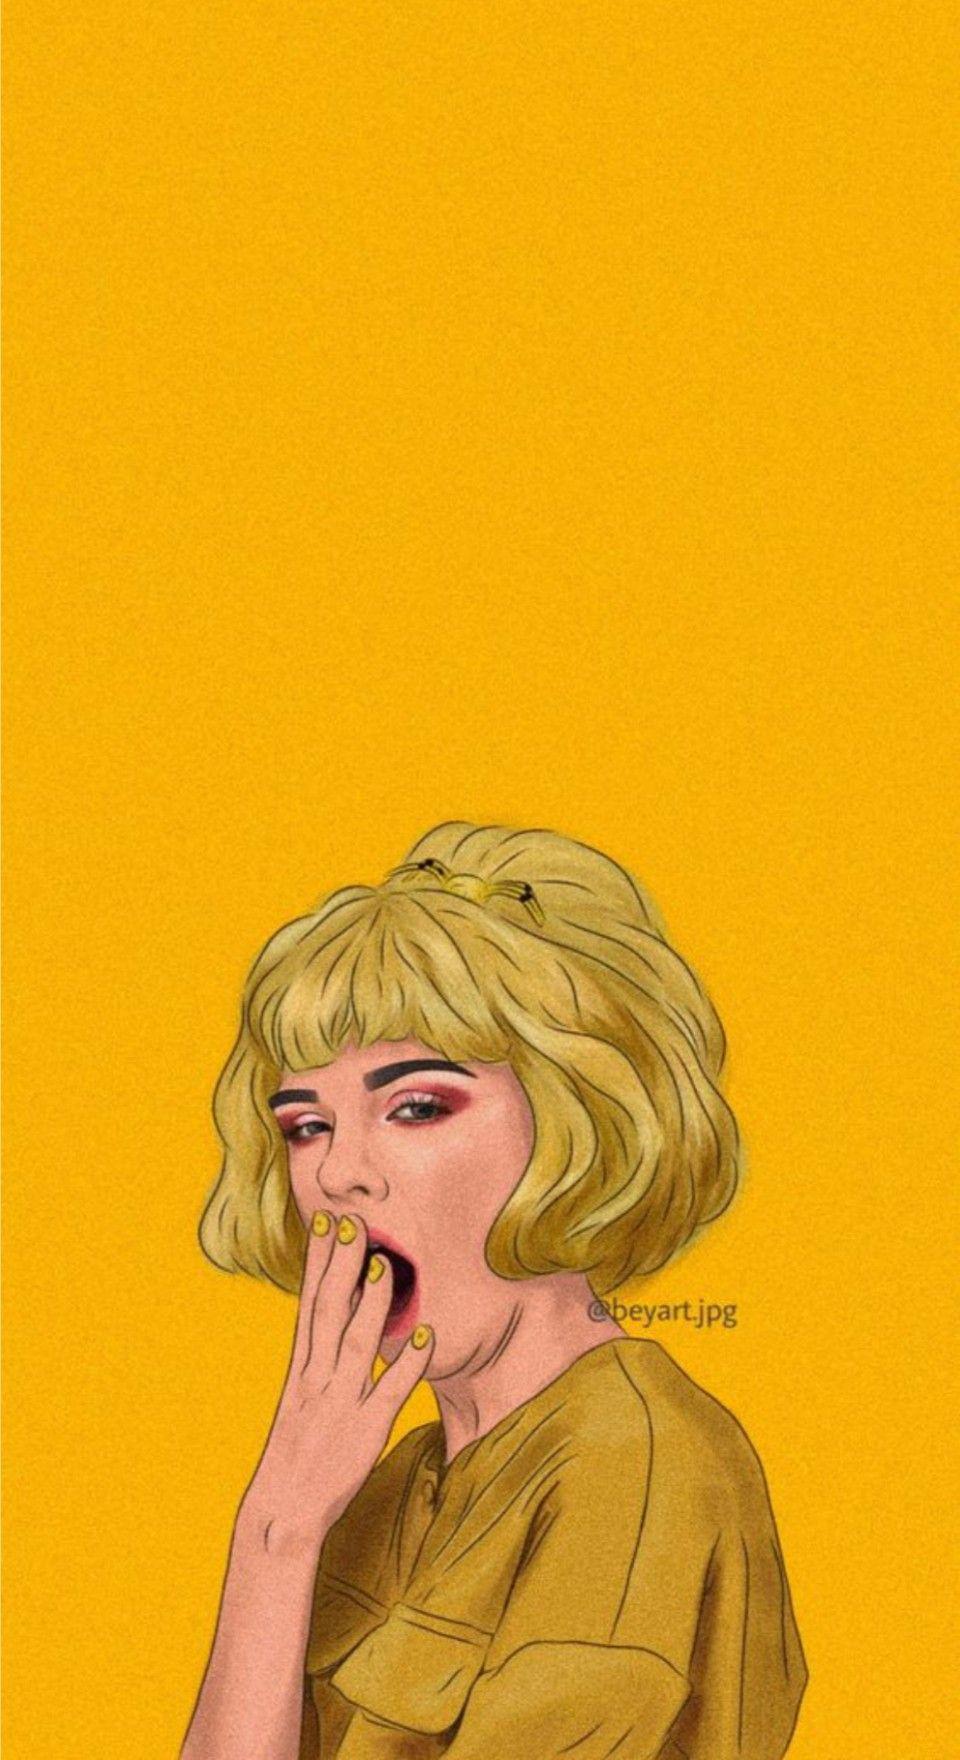 Hd Girly Wallpaper Cute Wallpaper Girl In 2020 Girls Cartoon Art Cute Wallpapers Girly Art